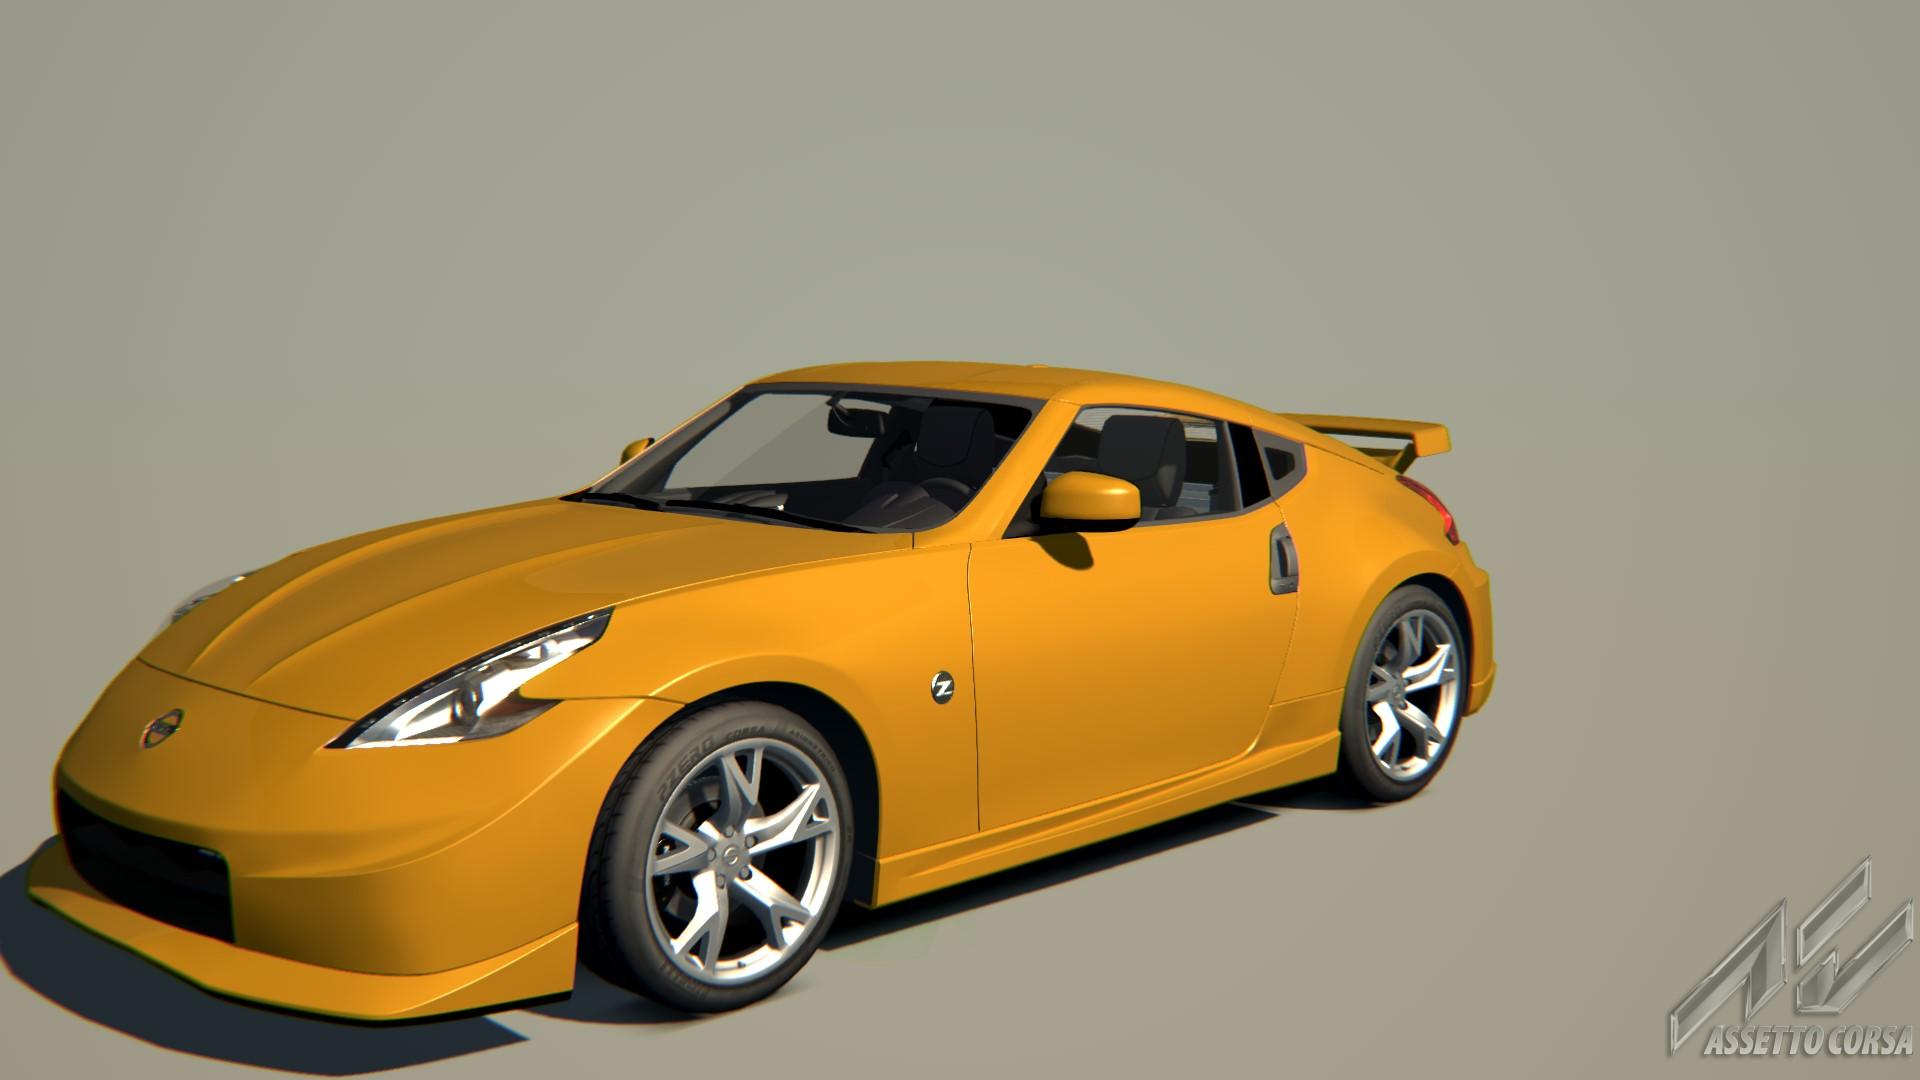 nissan 370z nismo nissan car detail assetto corsa. Black Bedroom Furniture Sets. Home Design Ideas